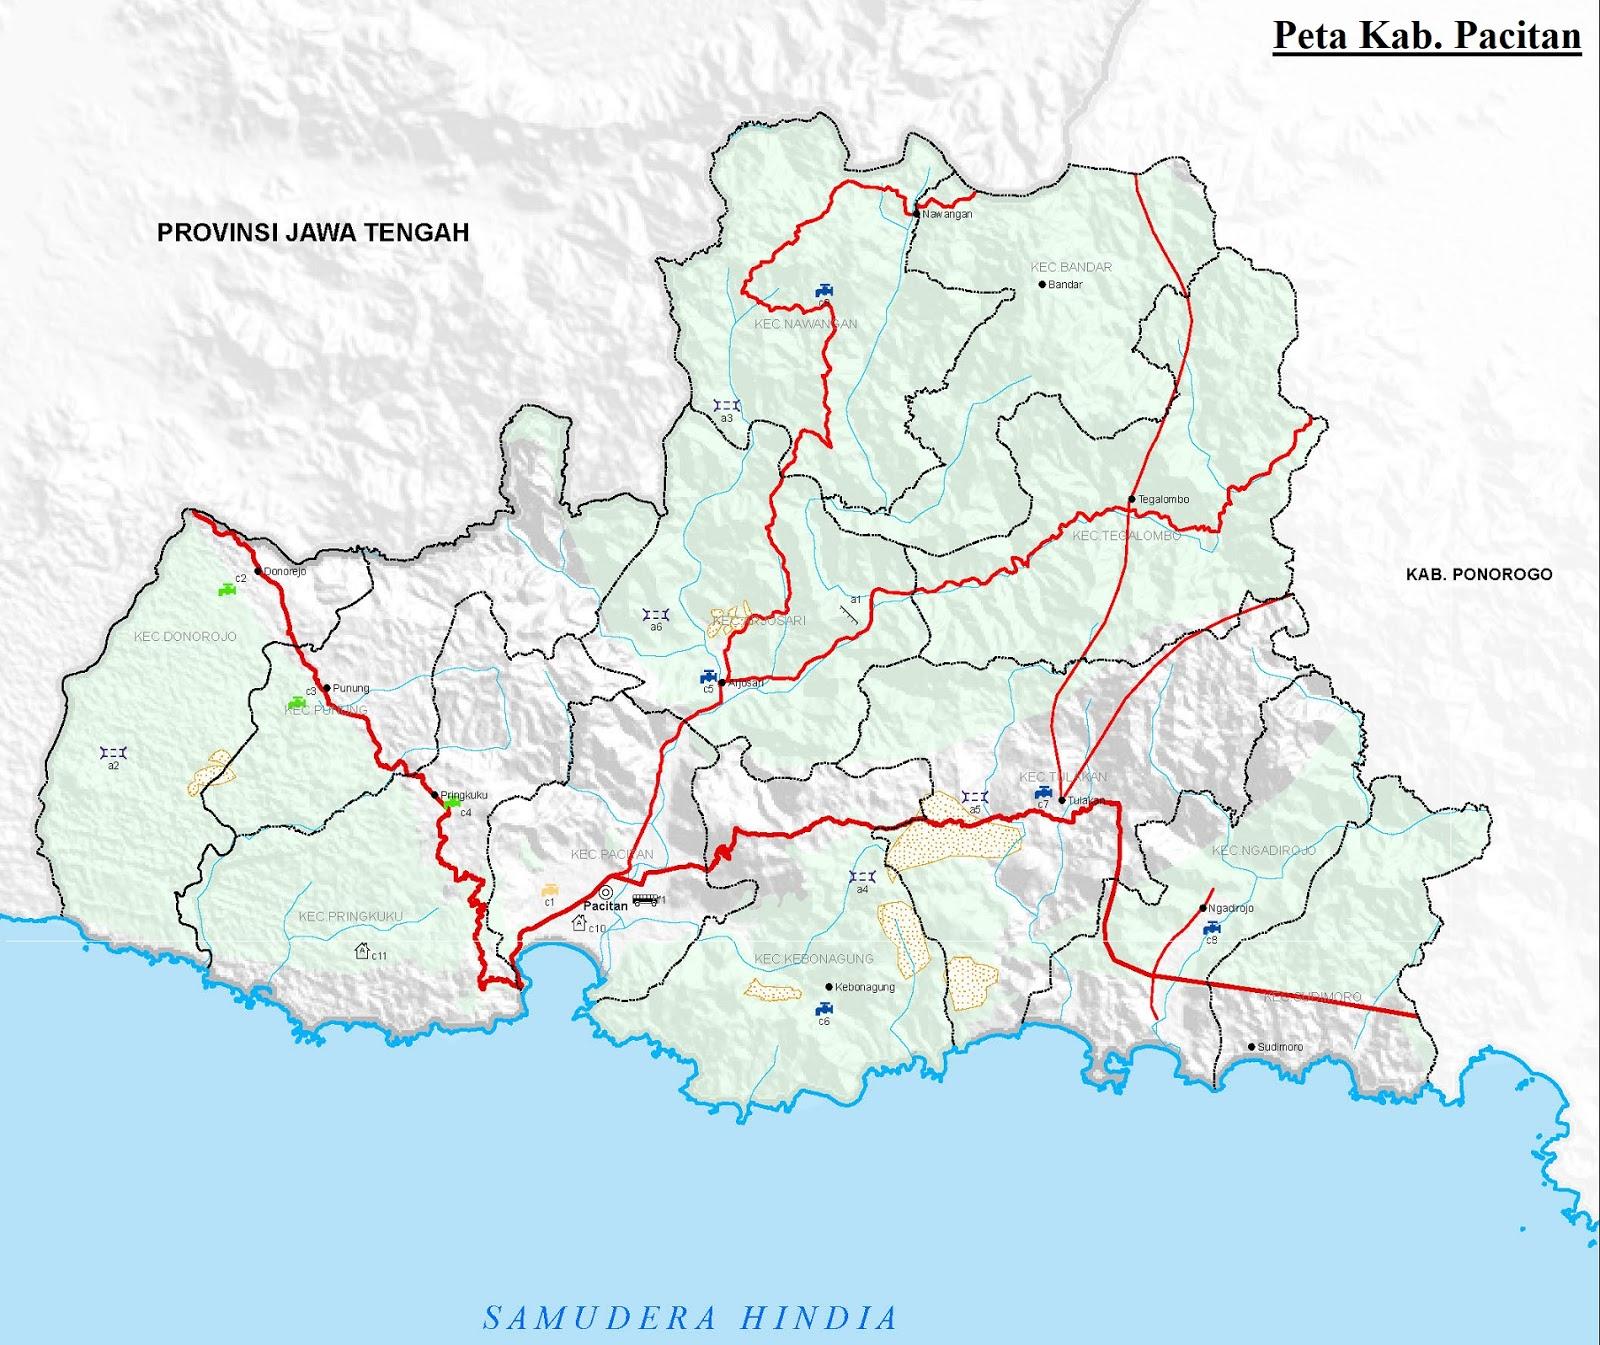 Gambar Peta Kabupaten Pacitan HD